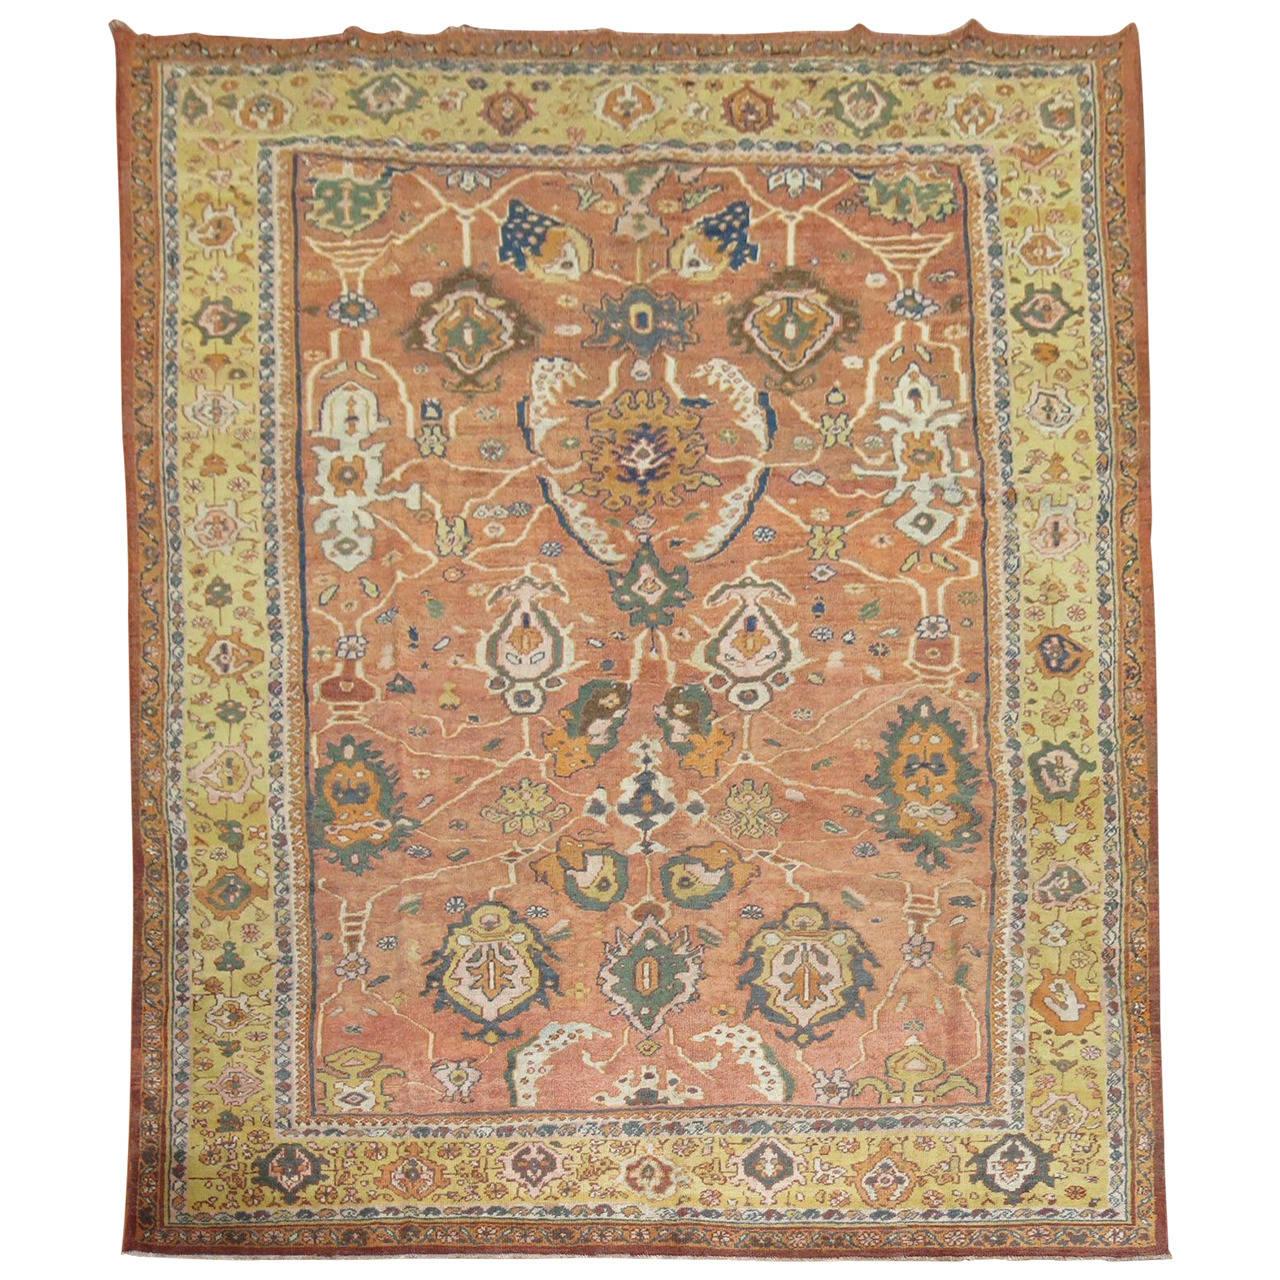 Persian Mahal Rug For Sale At 1stdibs